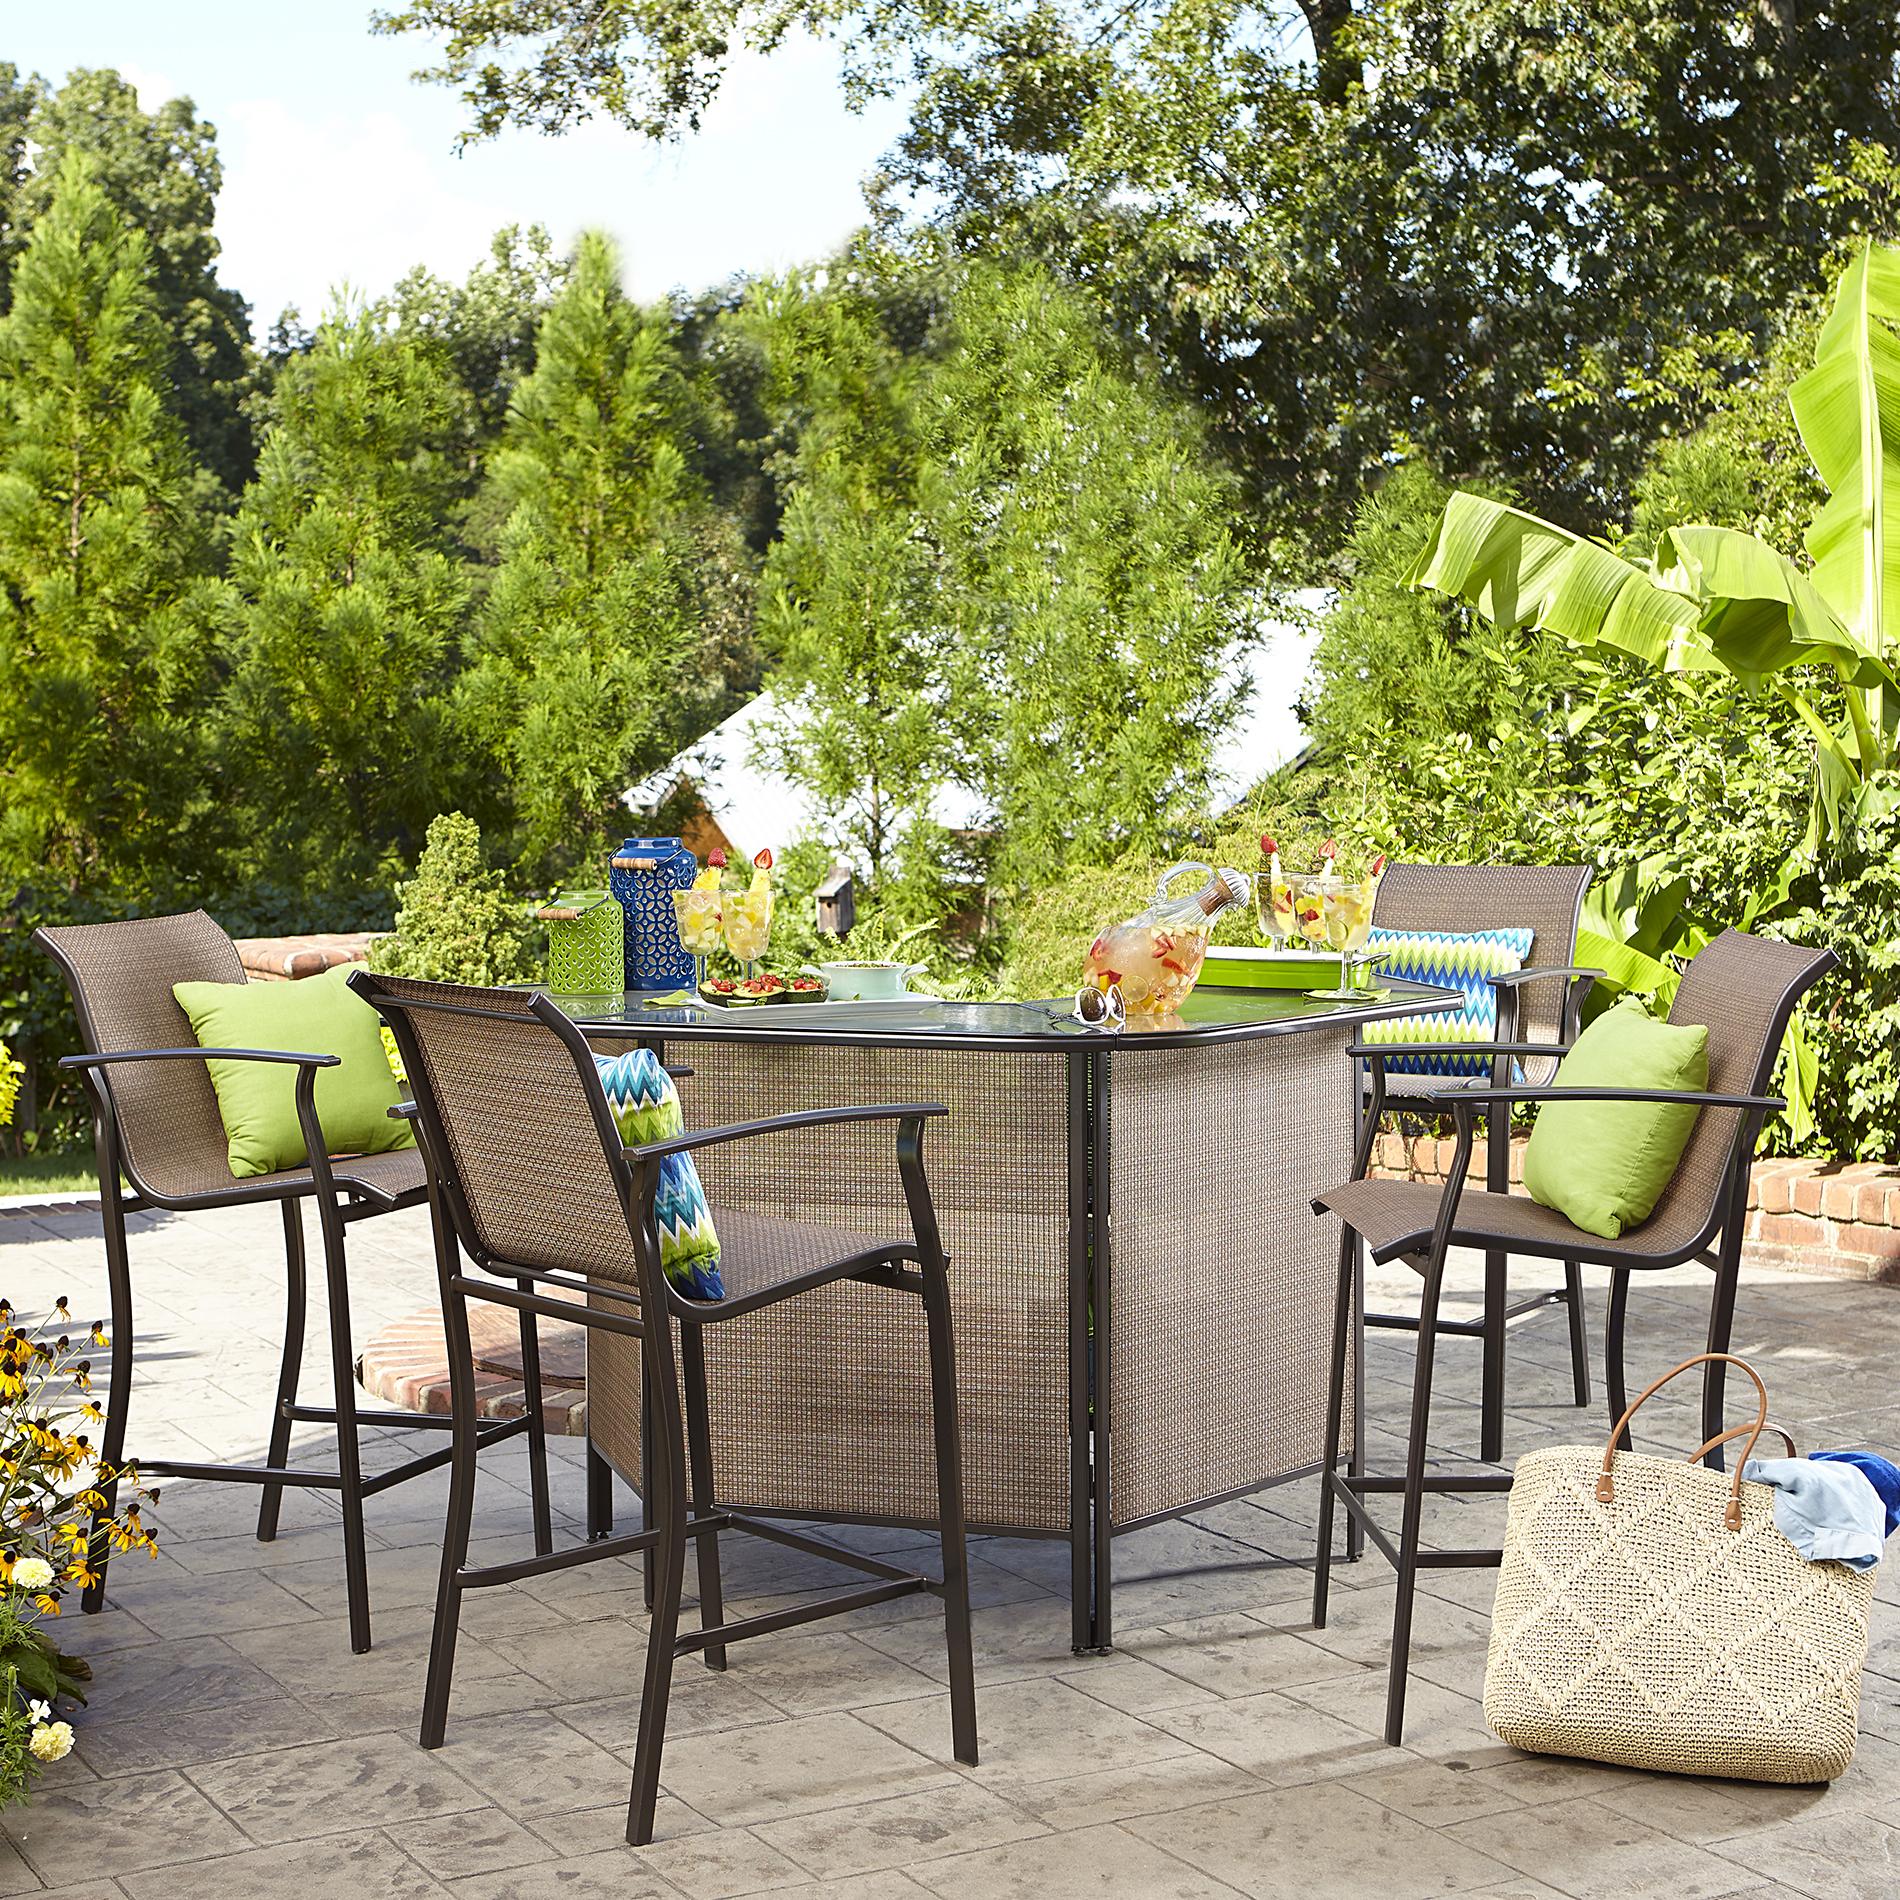 Outdoor bar set garden oasis harrison 5-piece outdoor bar set in tan - sears EAAMMDU